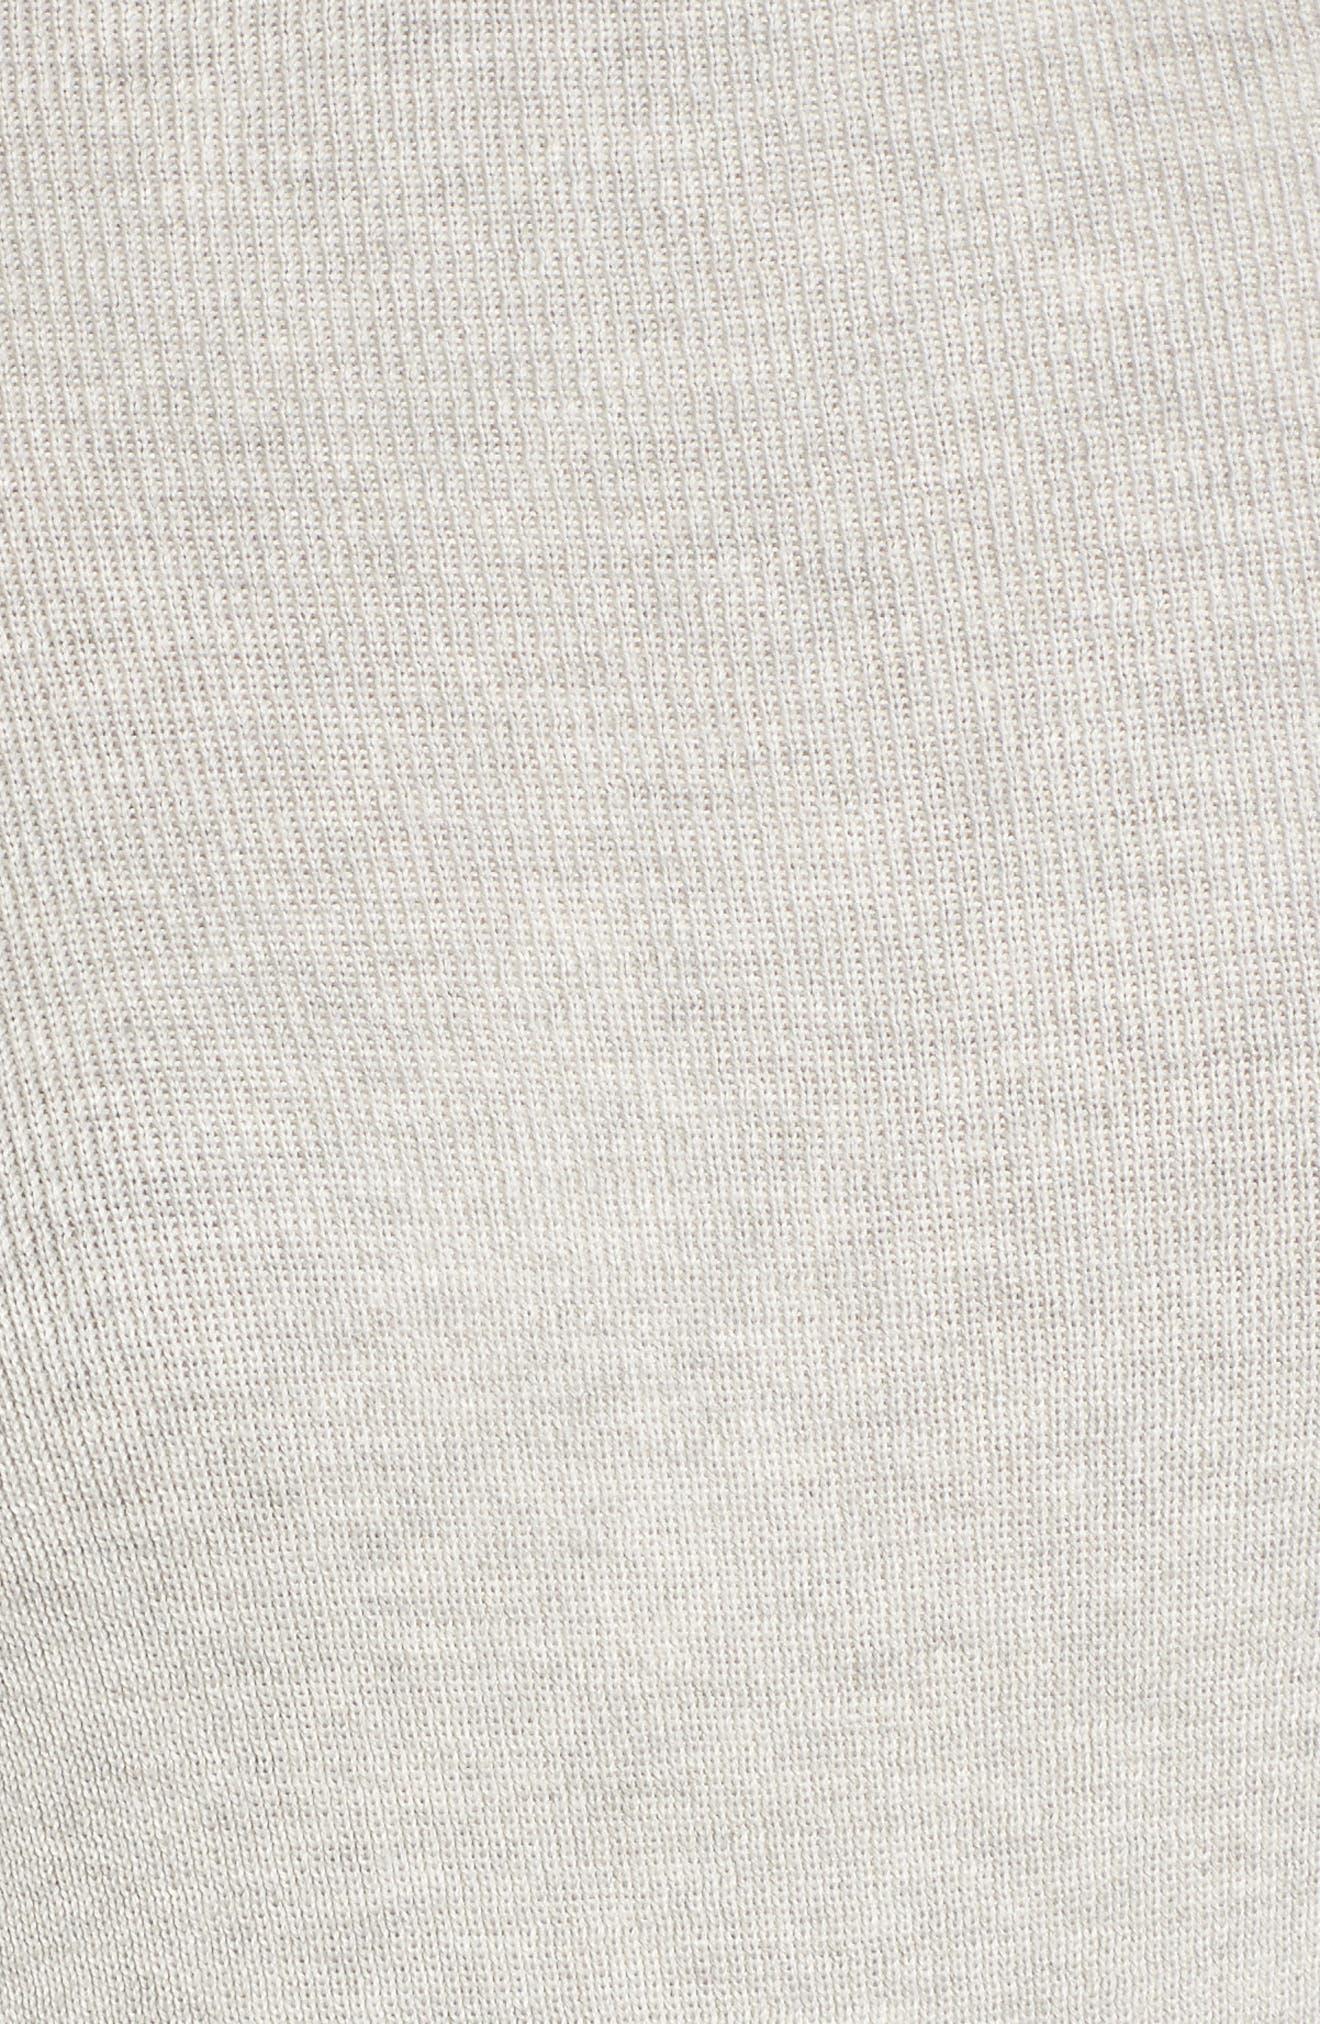 Bell Sleeve Rib Sweater,                             Alternate thumbnail 18, color,